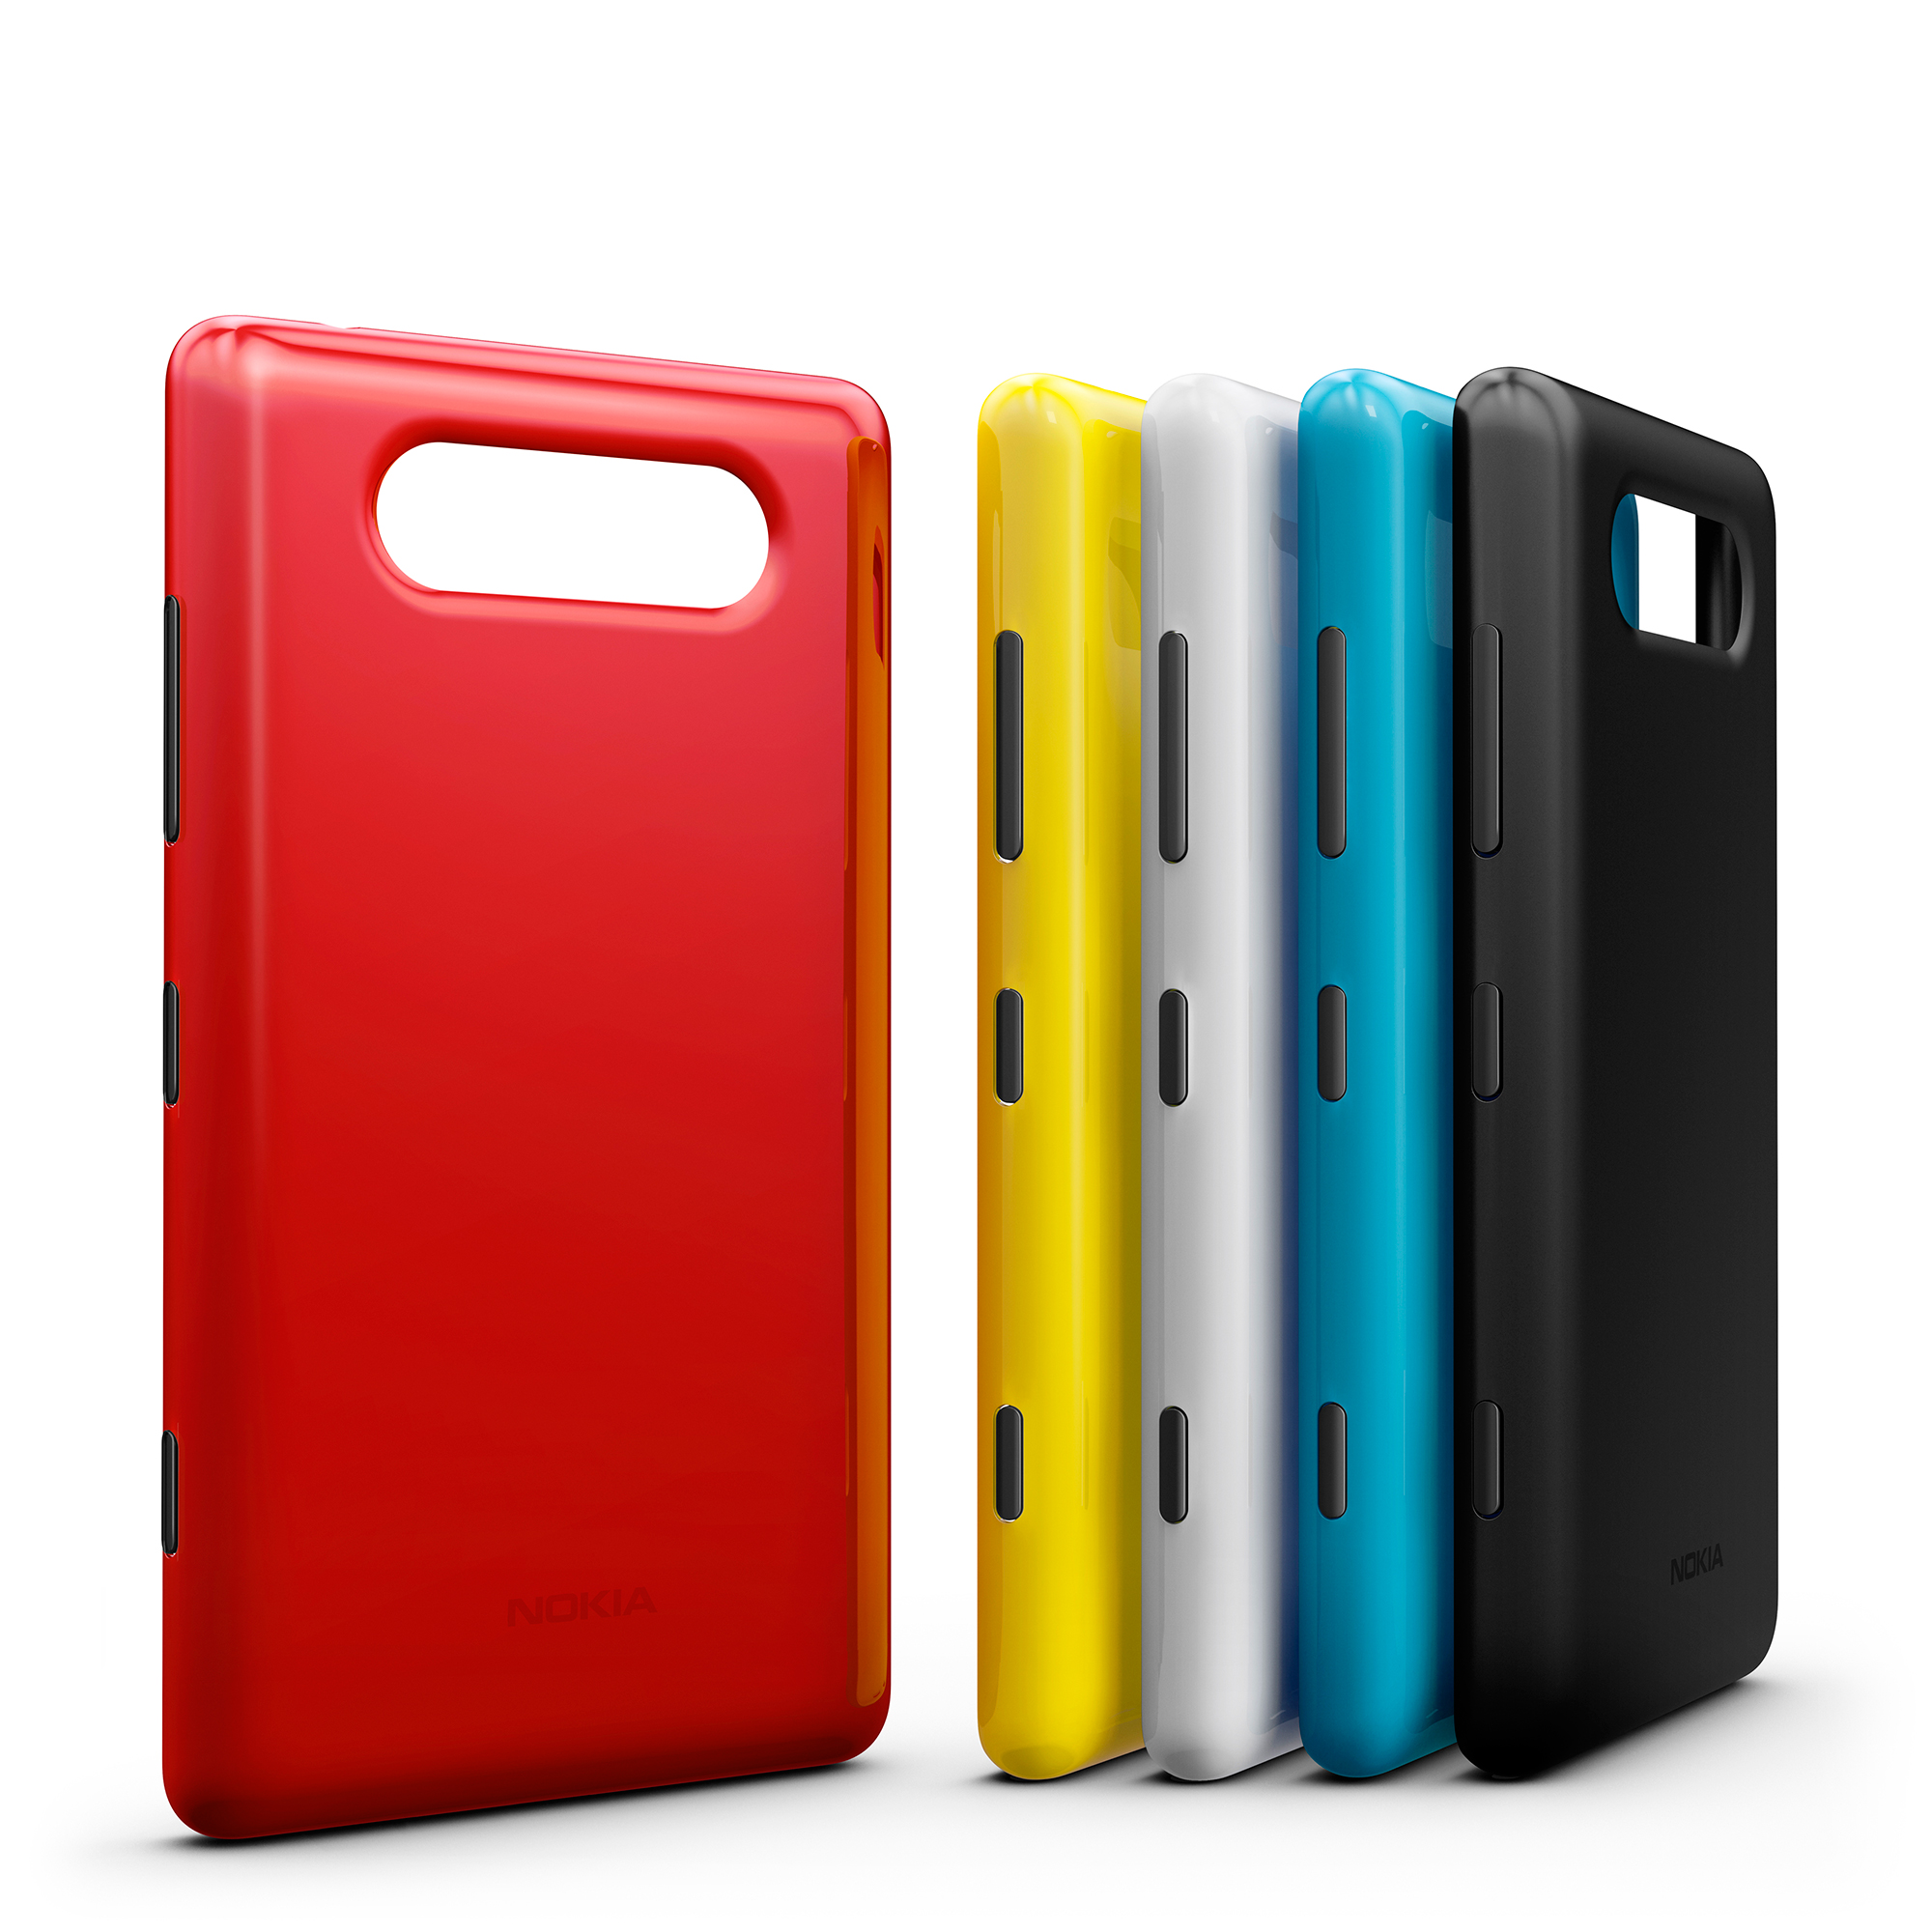 nokia lumia 820 прошивка windows phone 10